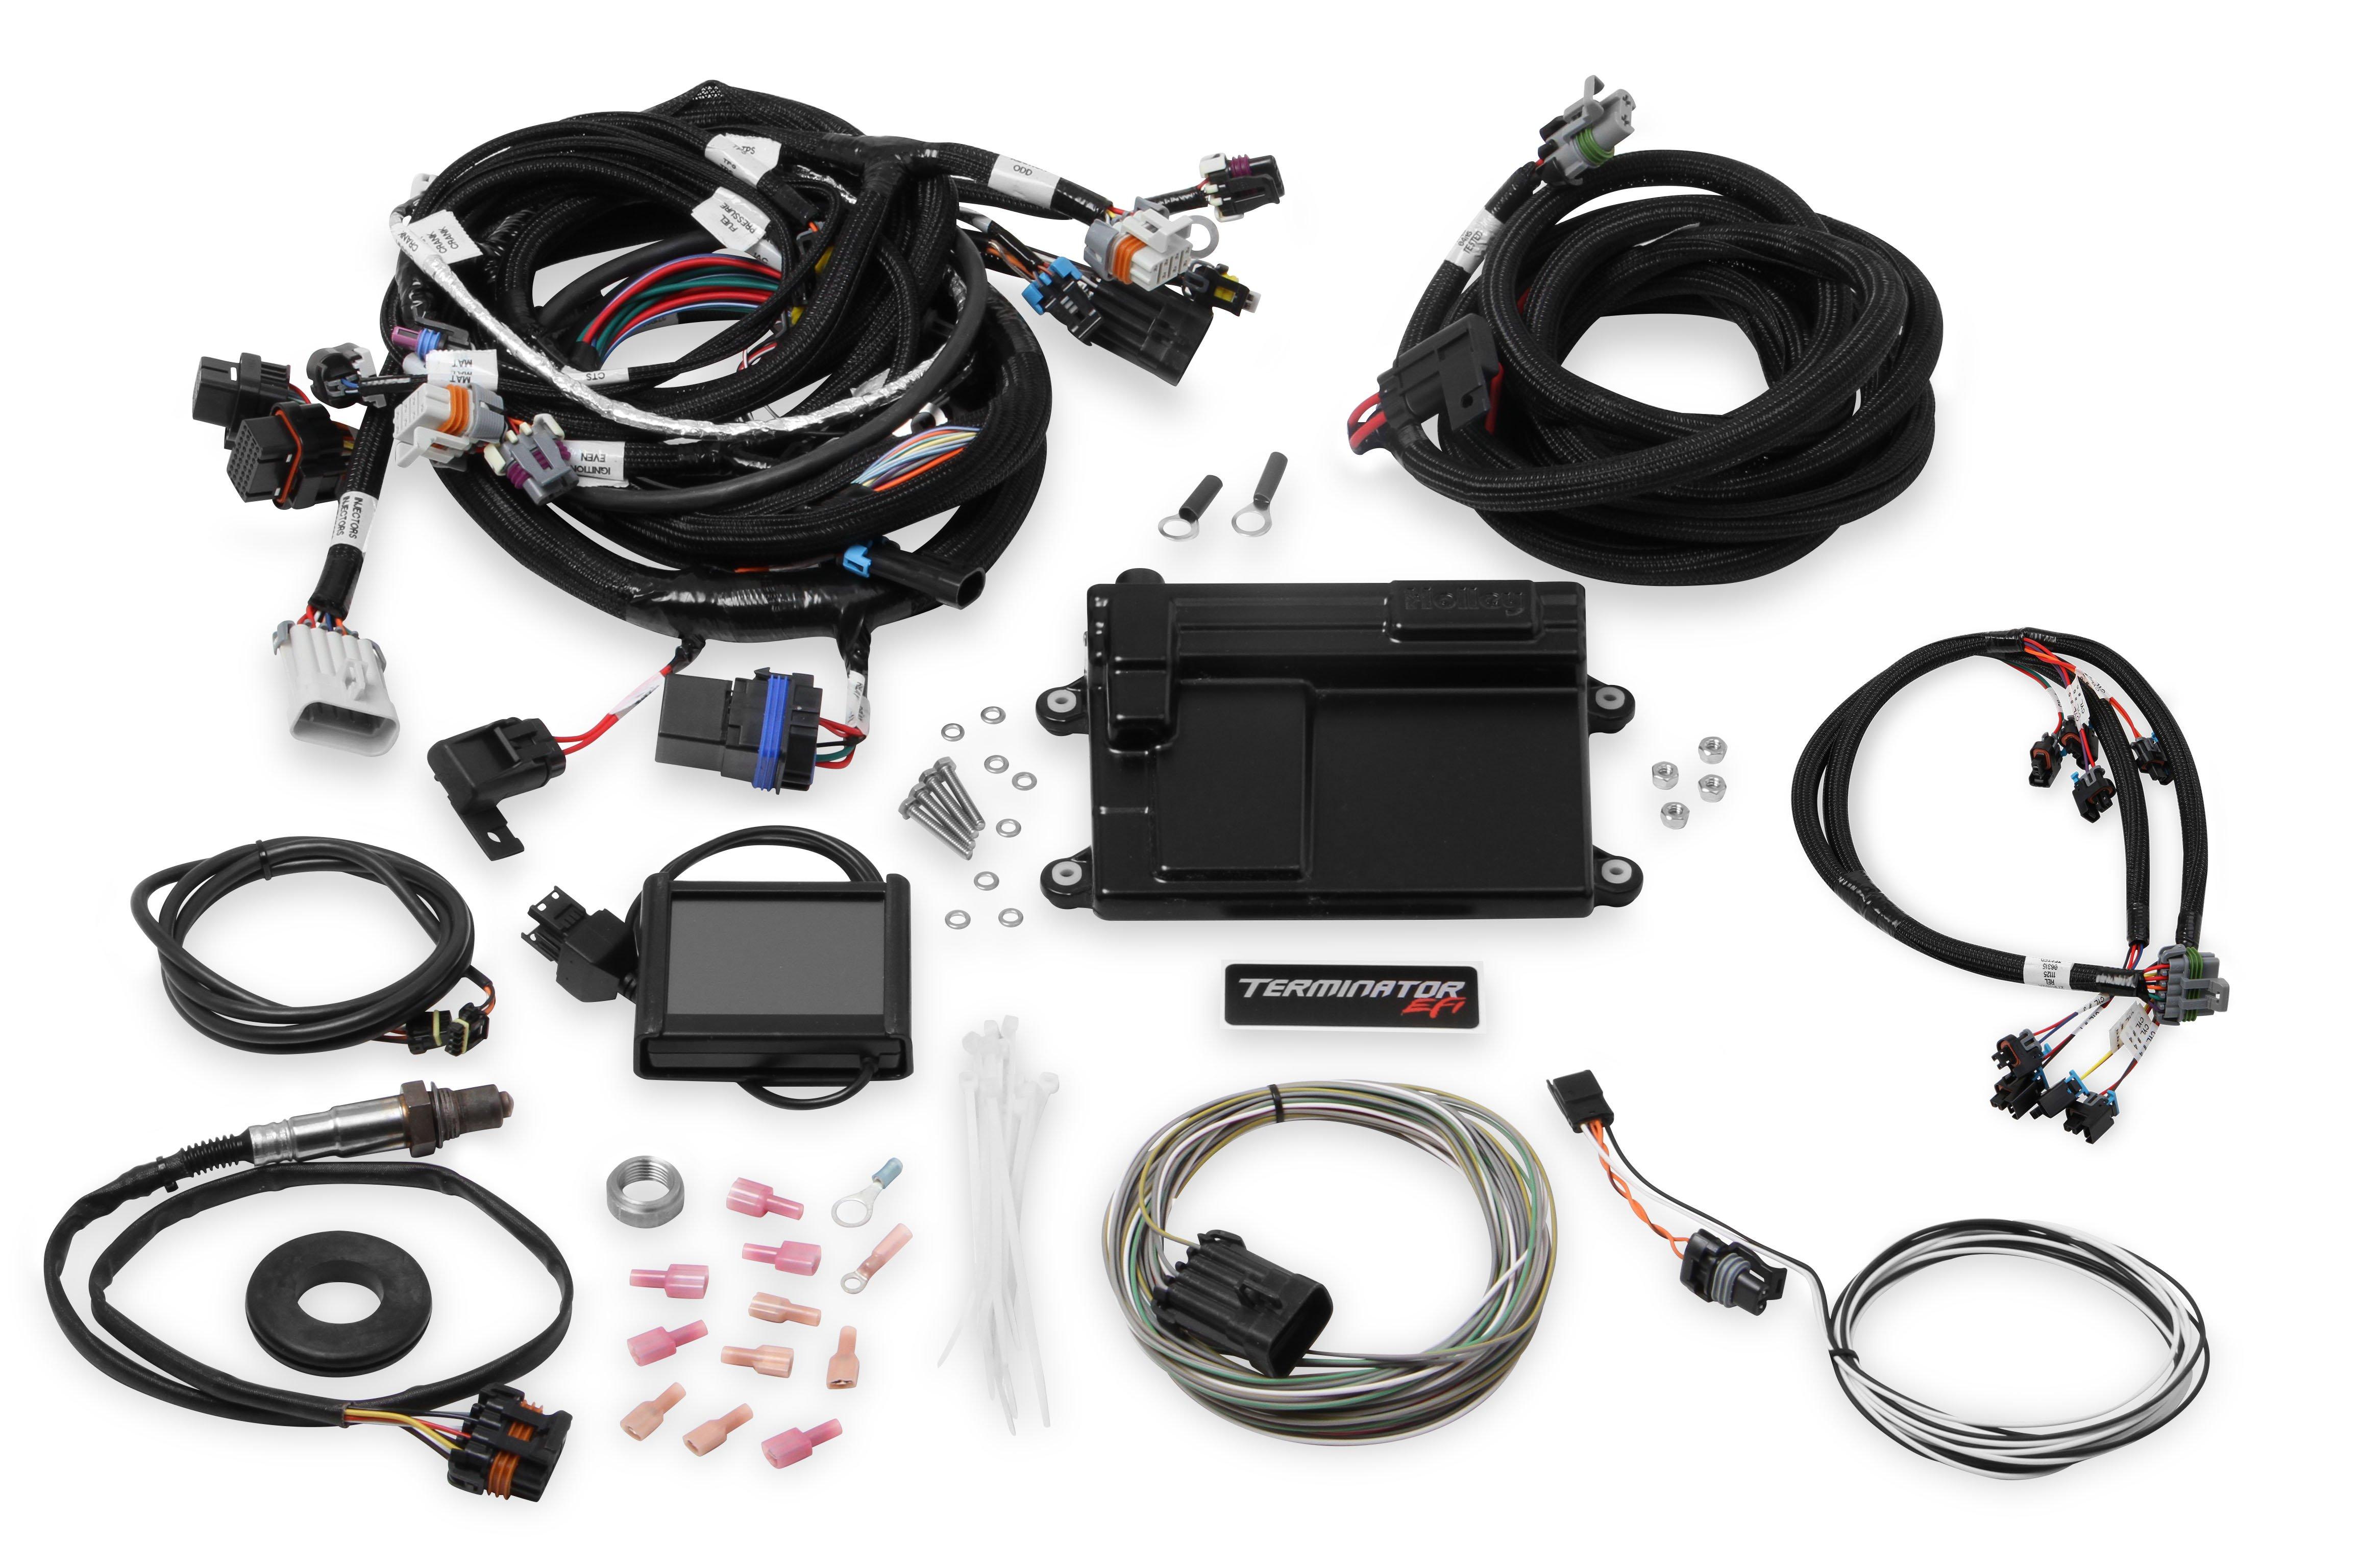 Holley Efi 550 614 Terminator Ls Mpfi Kit 1987 Chevy Sprint Turbo Wiring Diagram Image